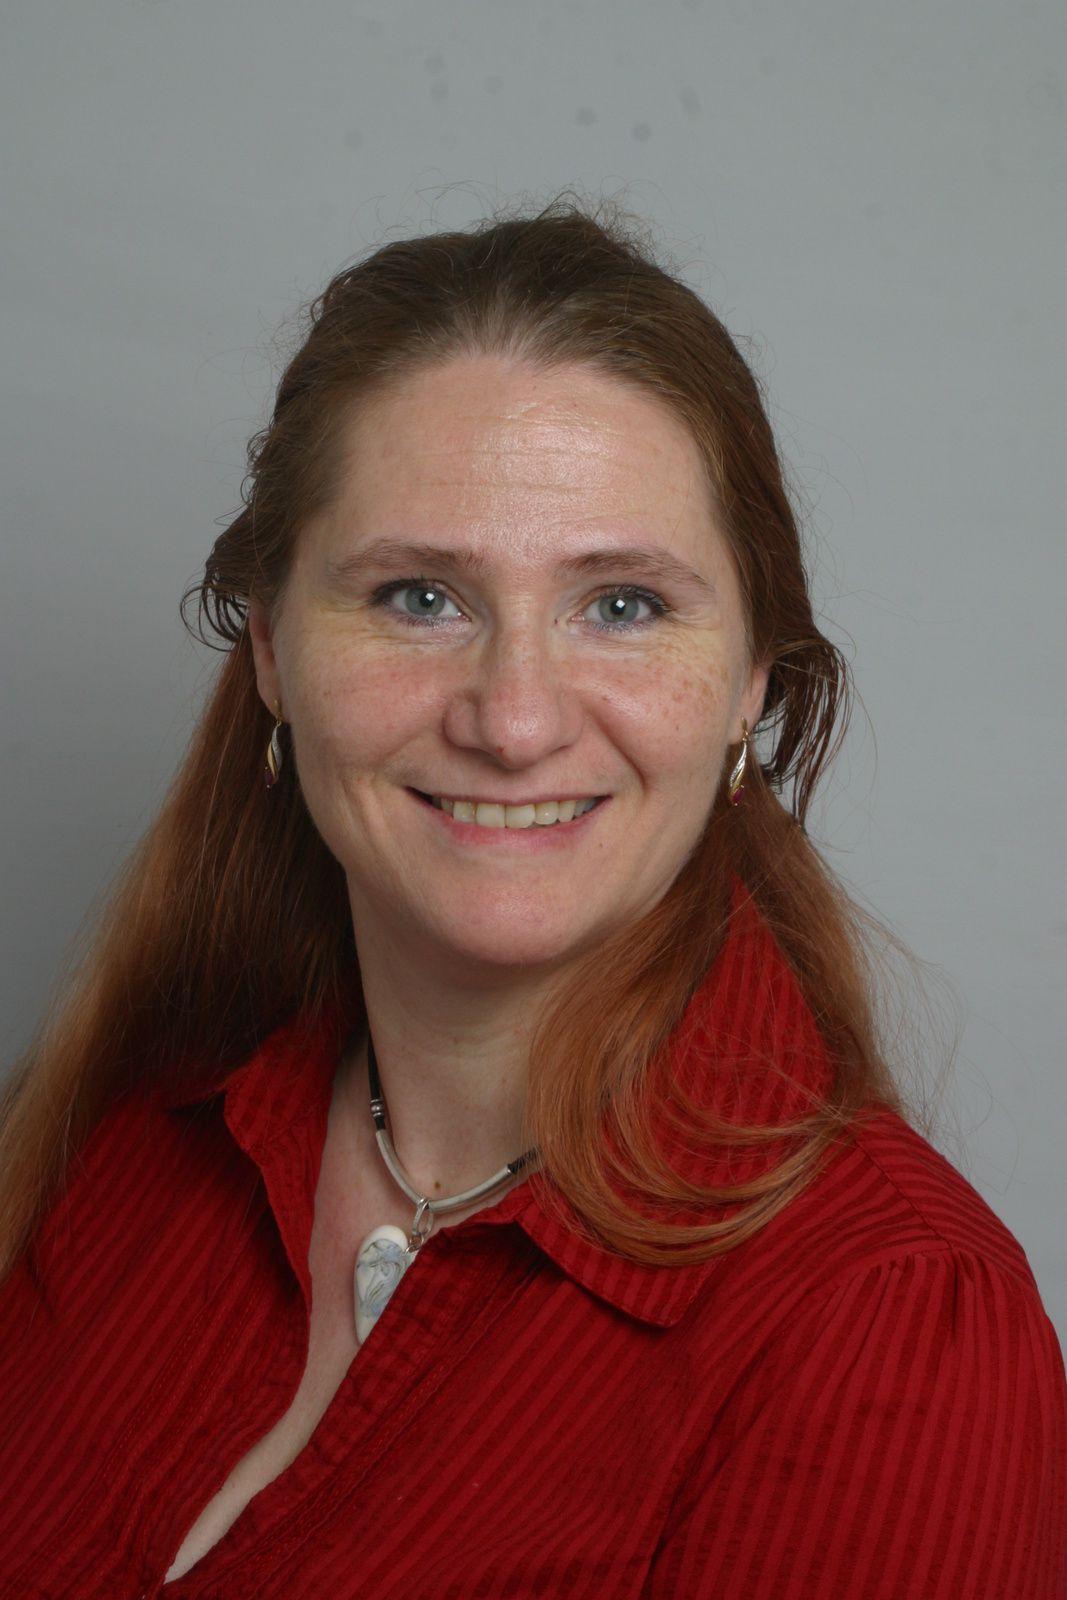 Nathalie KUBLER,48 ans, habite Wittelsheim centre